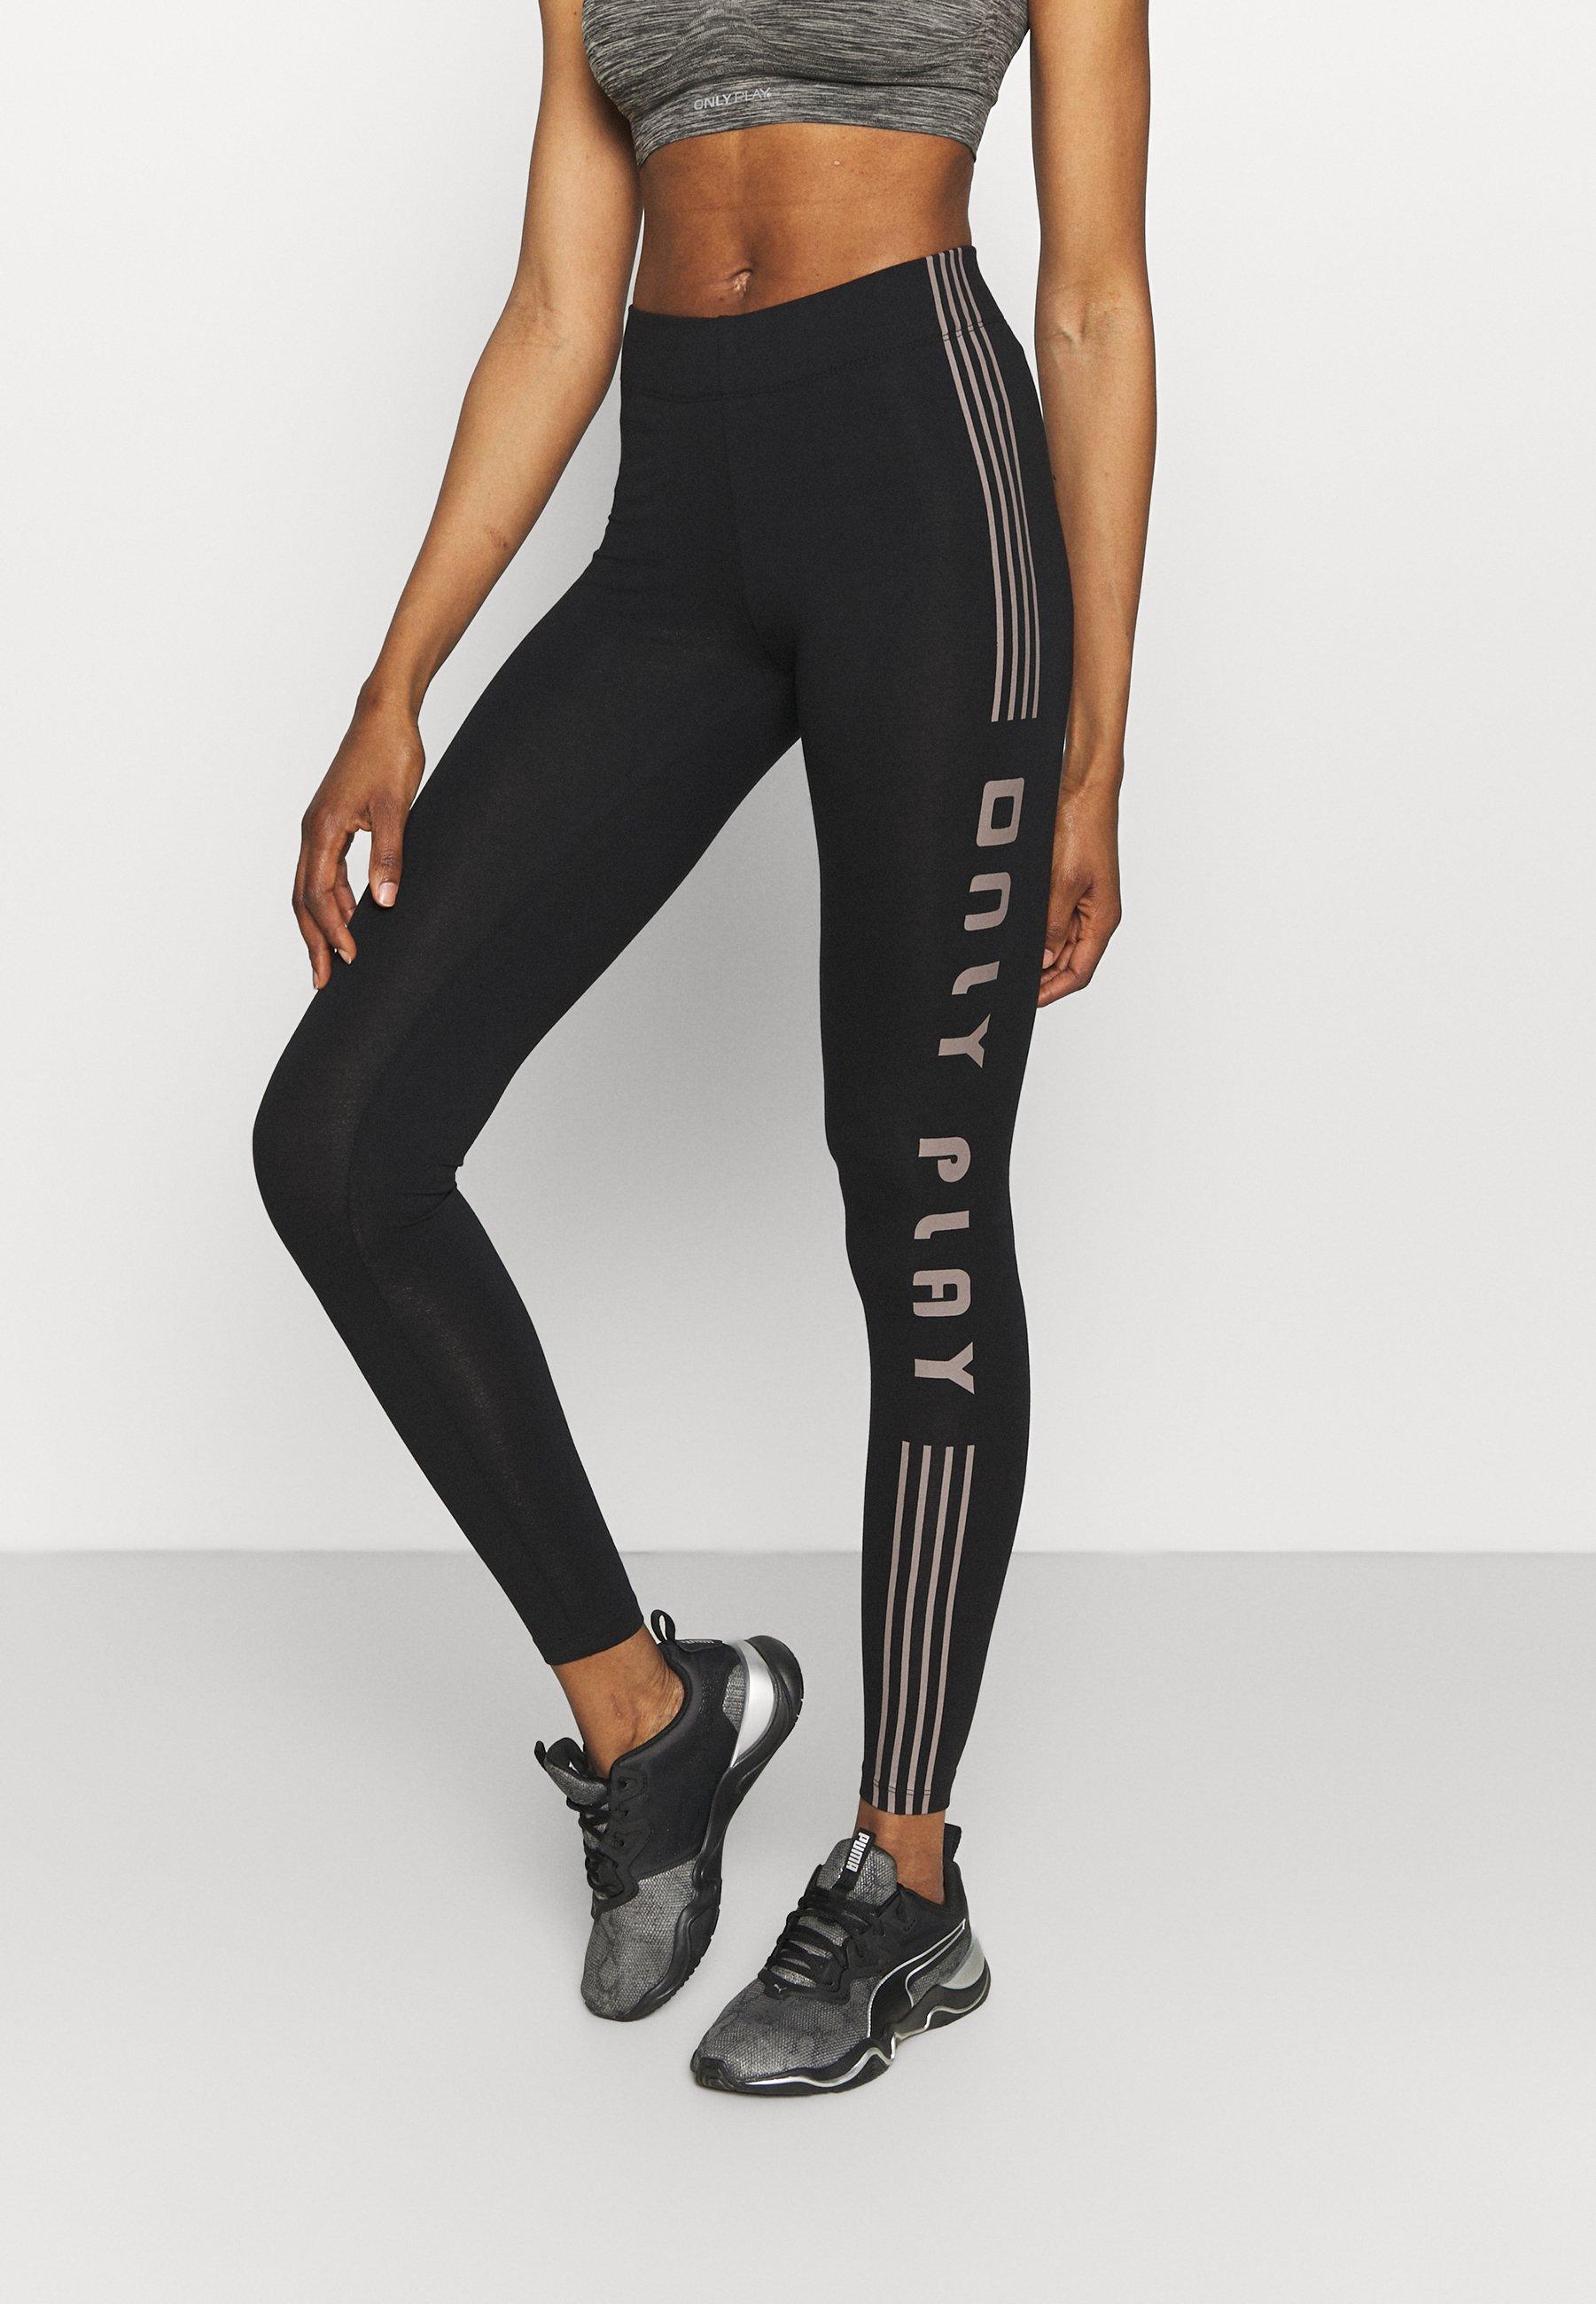 Femme ONPJUTA LIFE LEG - Collants